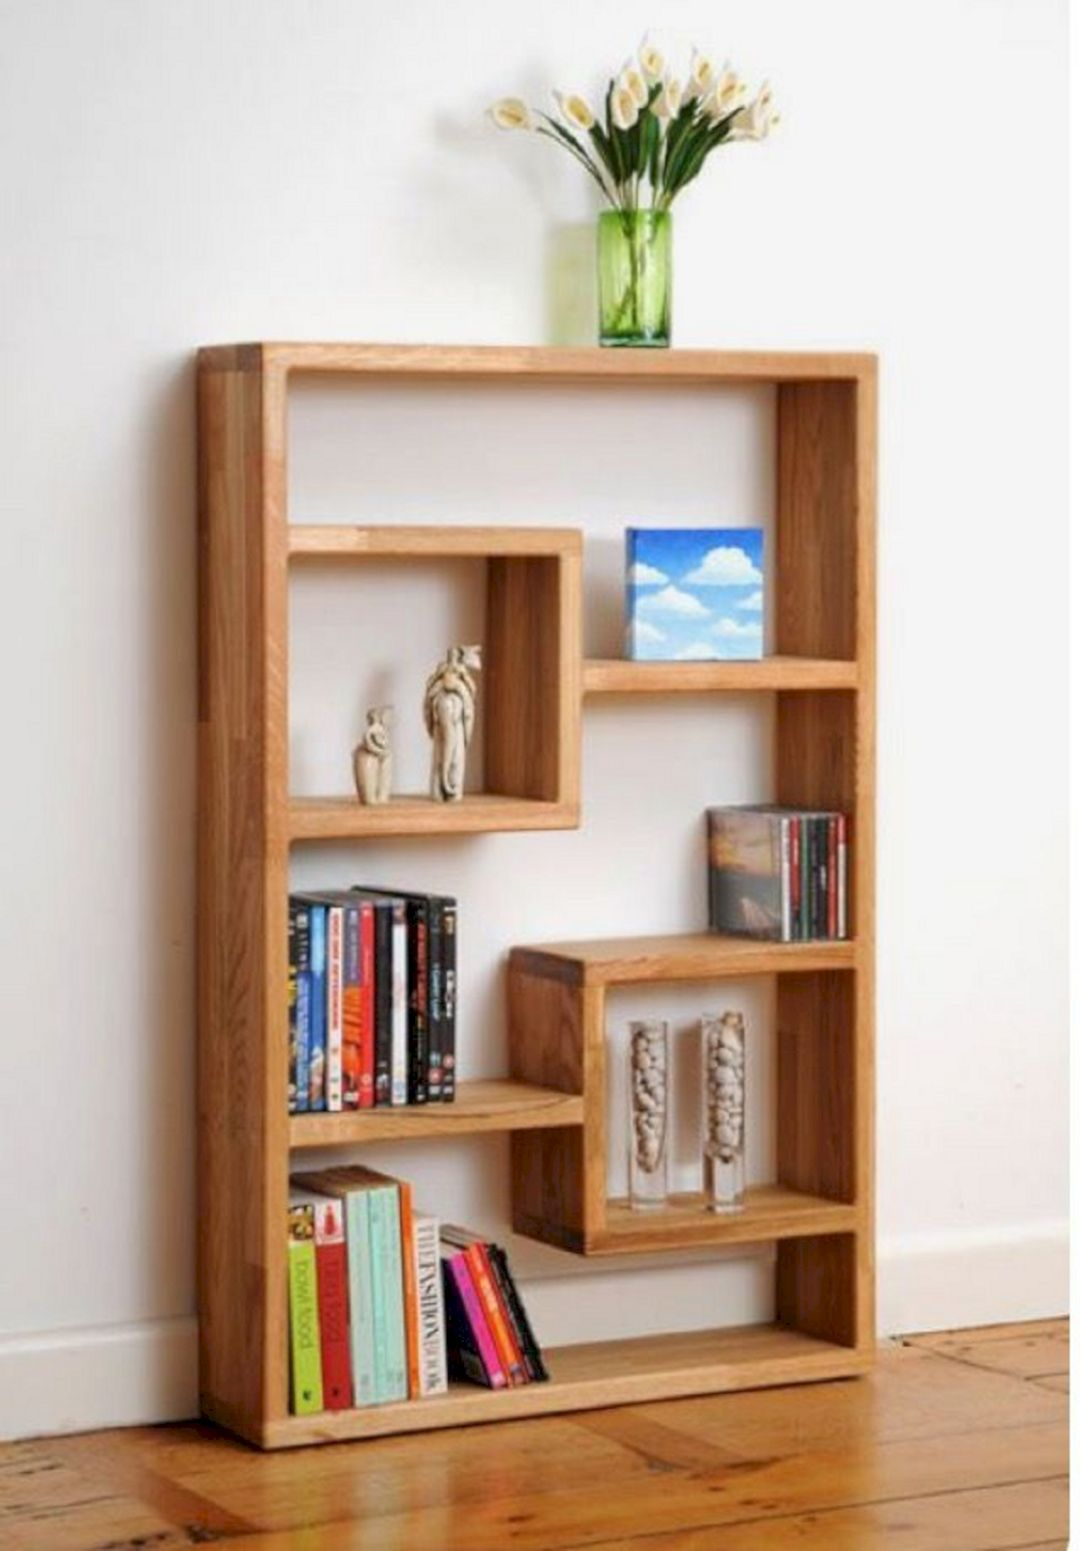 10+ Awesome DIY Bookshelf Design Ideas Anyone Can Do Itself -   16 diy Bookshelf small ideas